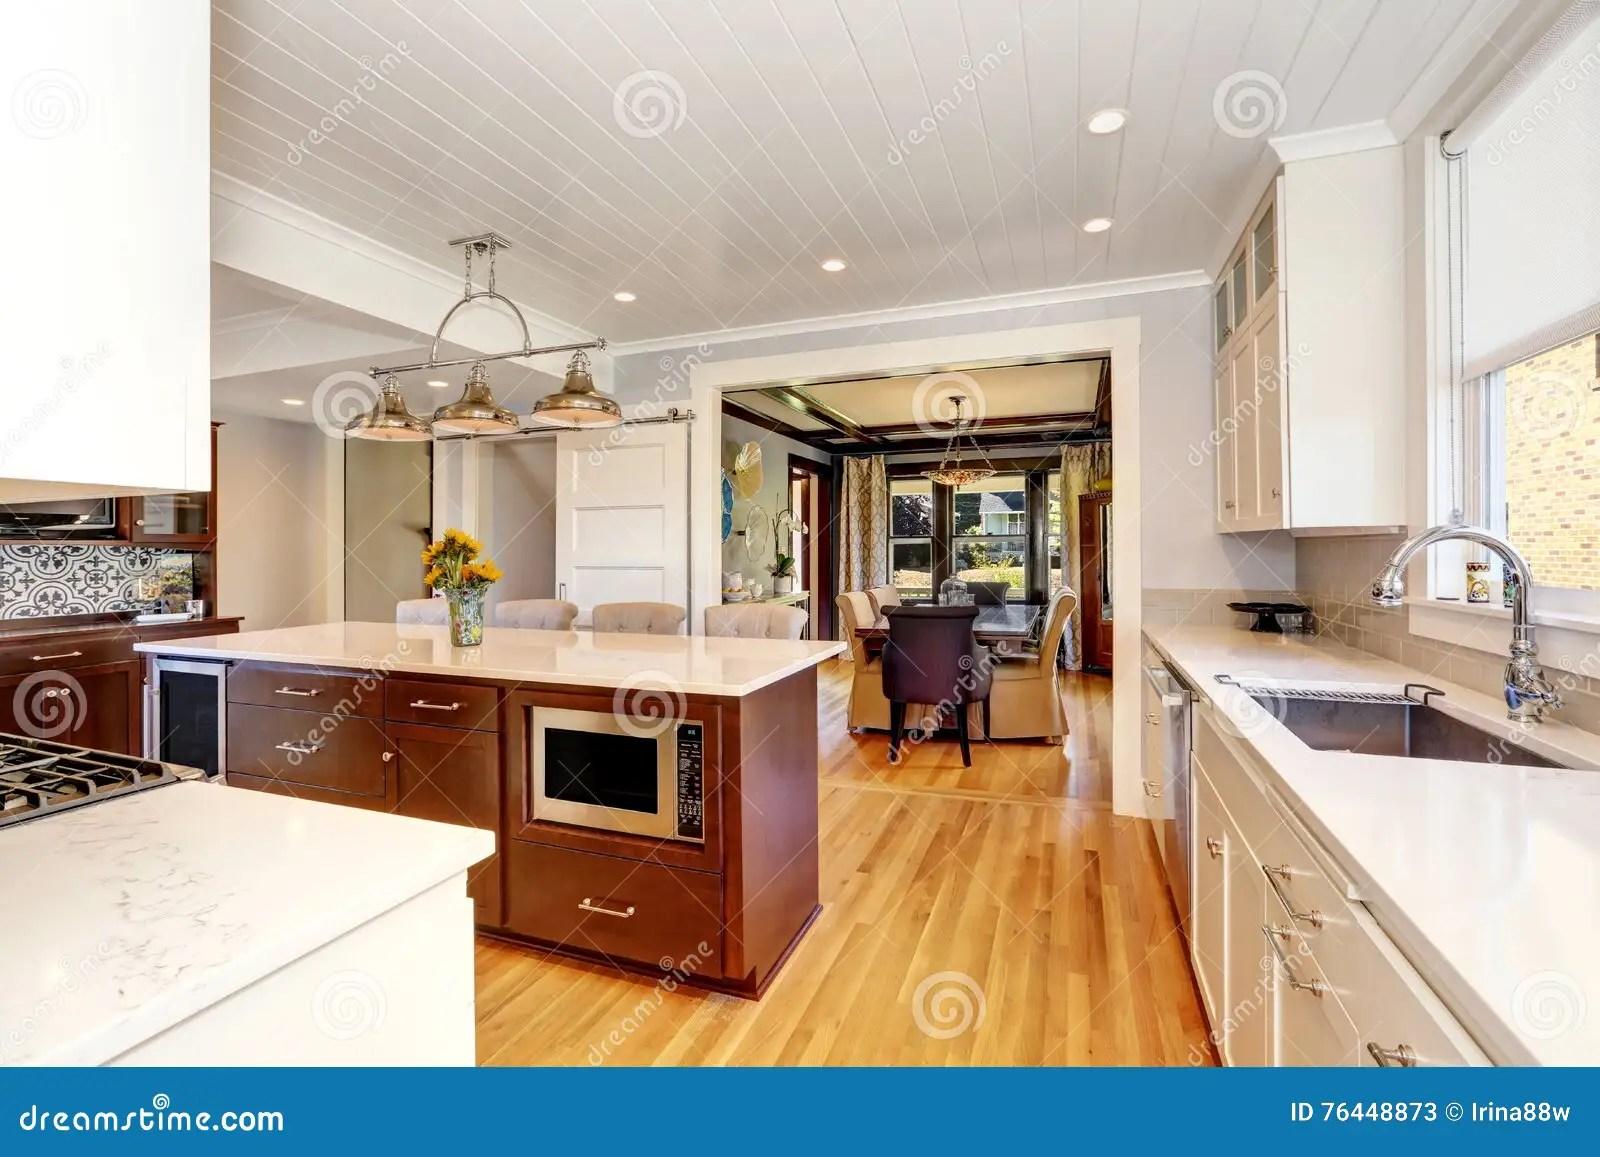 kitchen updates bbq 厨房室白色内部有大厨房的库存图片 图片包括有厨房 更新 庄园 火炉 厨房室白色内部有大厨房 现代下垂光和存贮组合的餐厅在背景中西北 美国